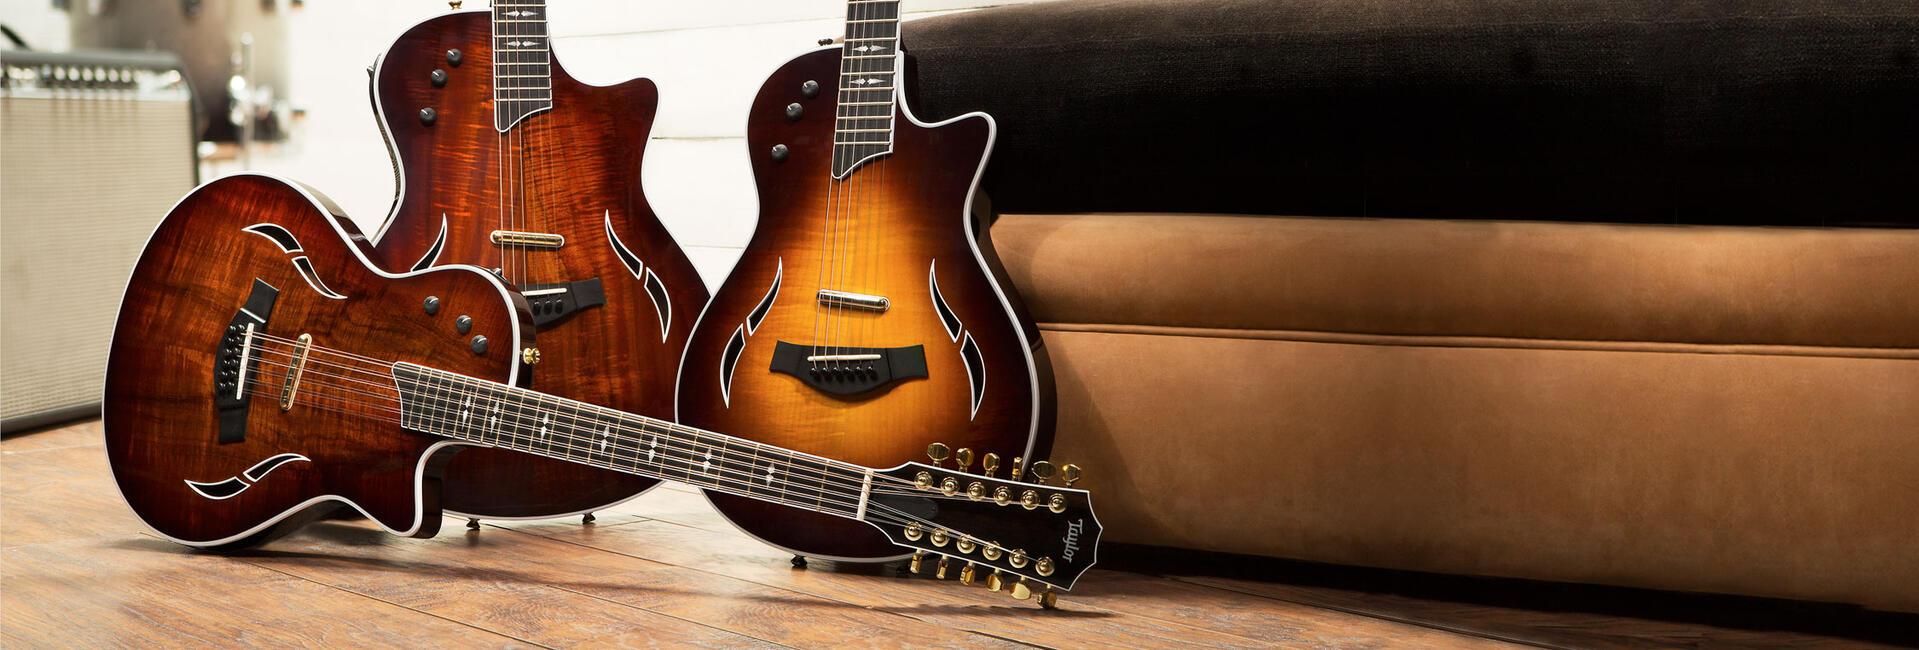 Taylor T5 Wiring Diagram Guitar Electric Amazing Guitars